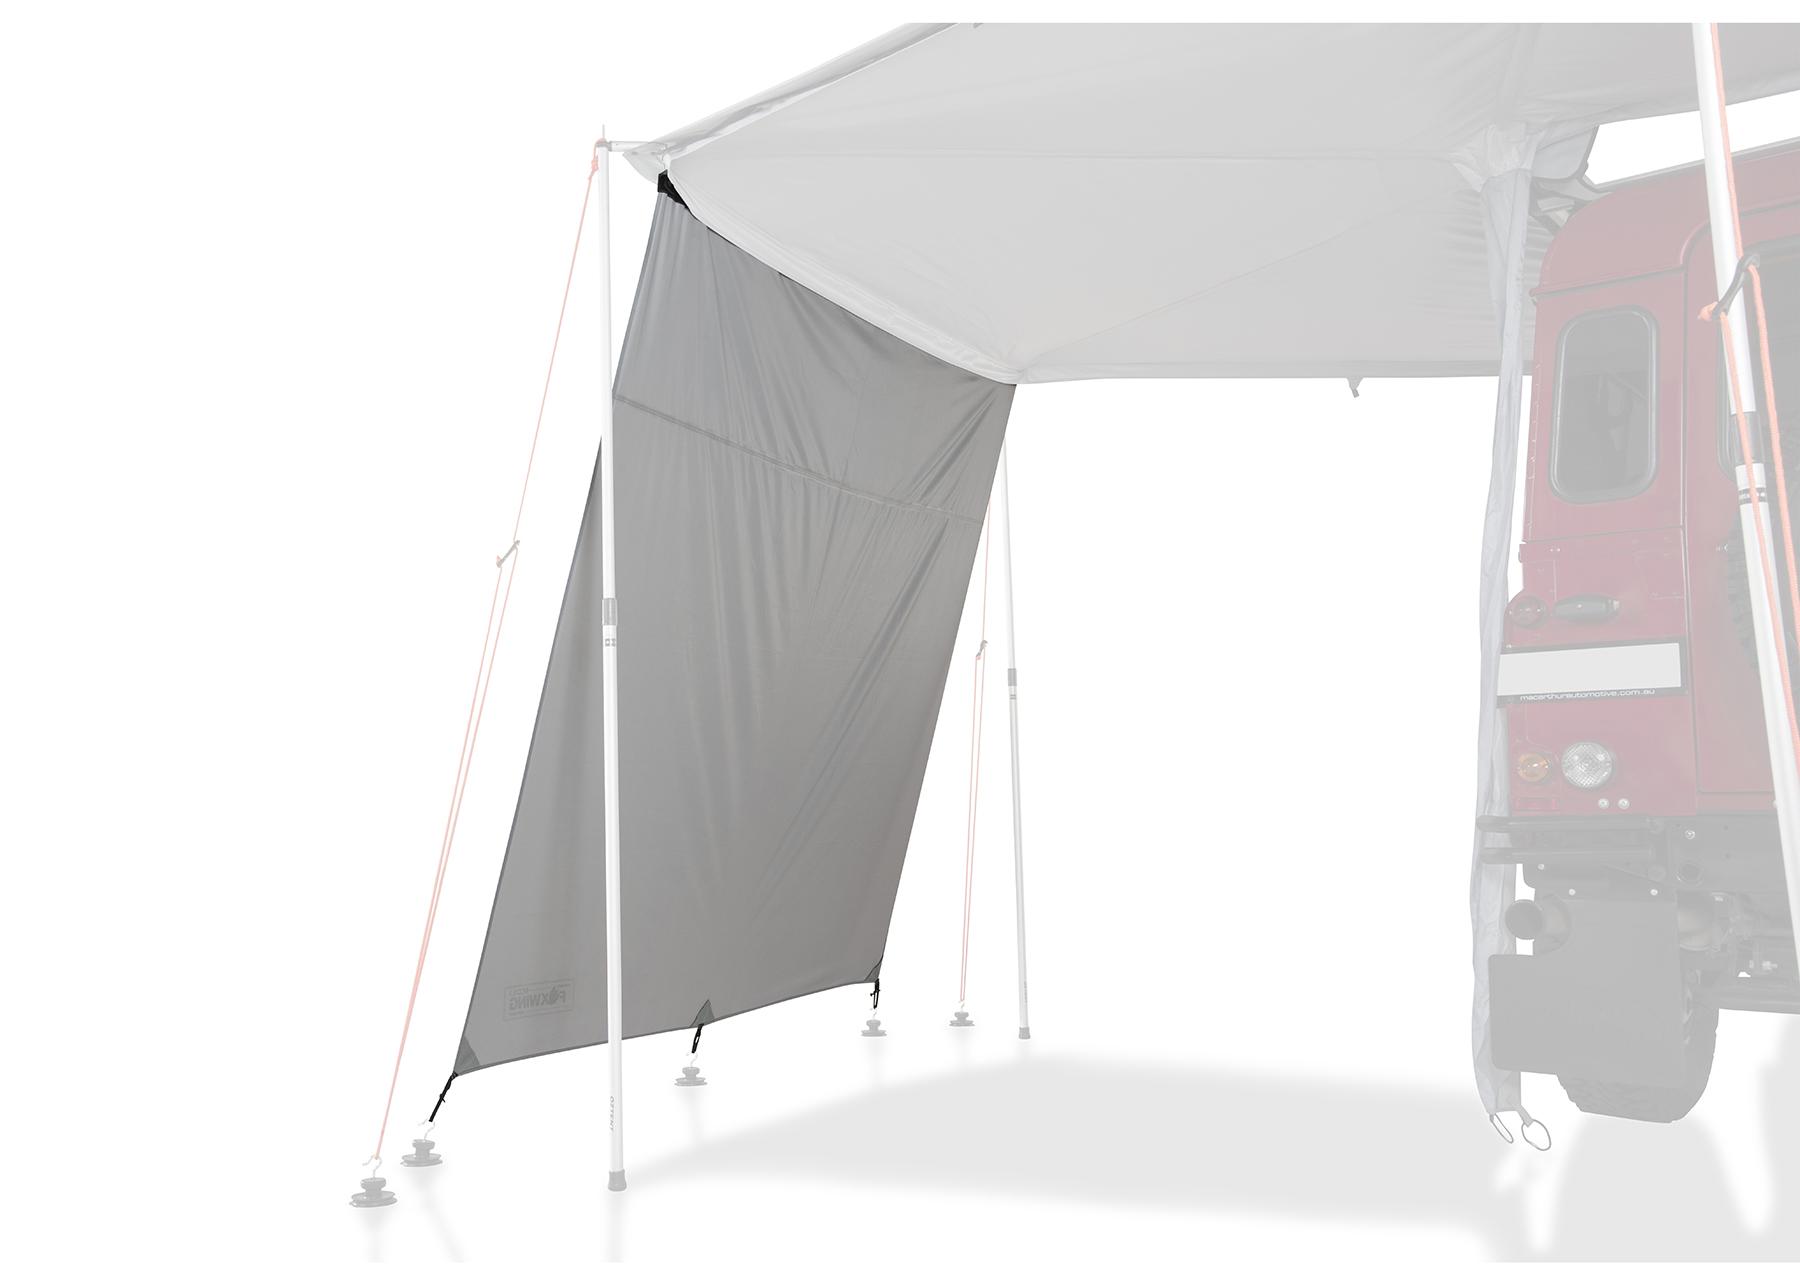 rhino rack seitenteil f r foxwing eco markise taubenreuther gmbh. Black Bedroom Furniture Sets. Home Design Ideas